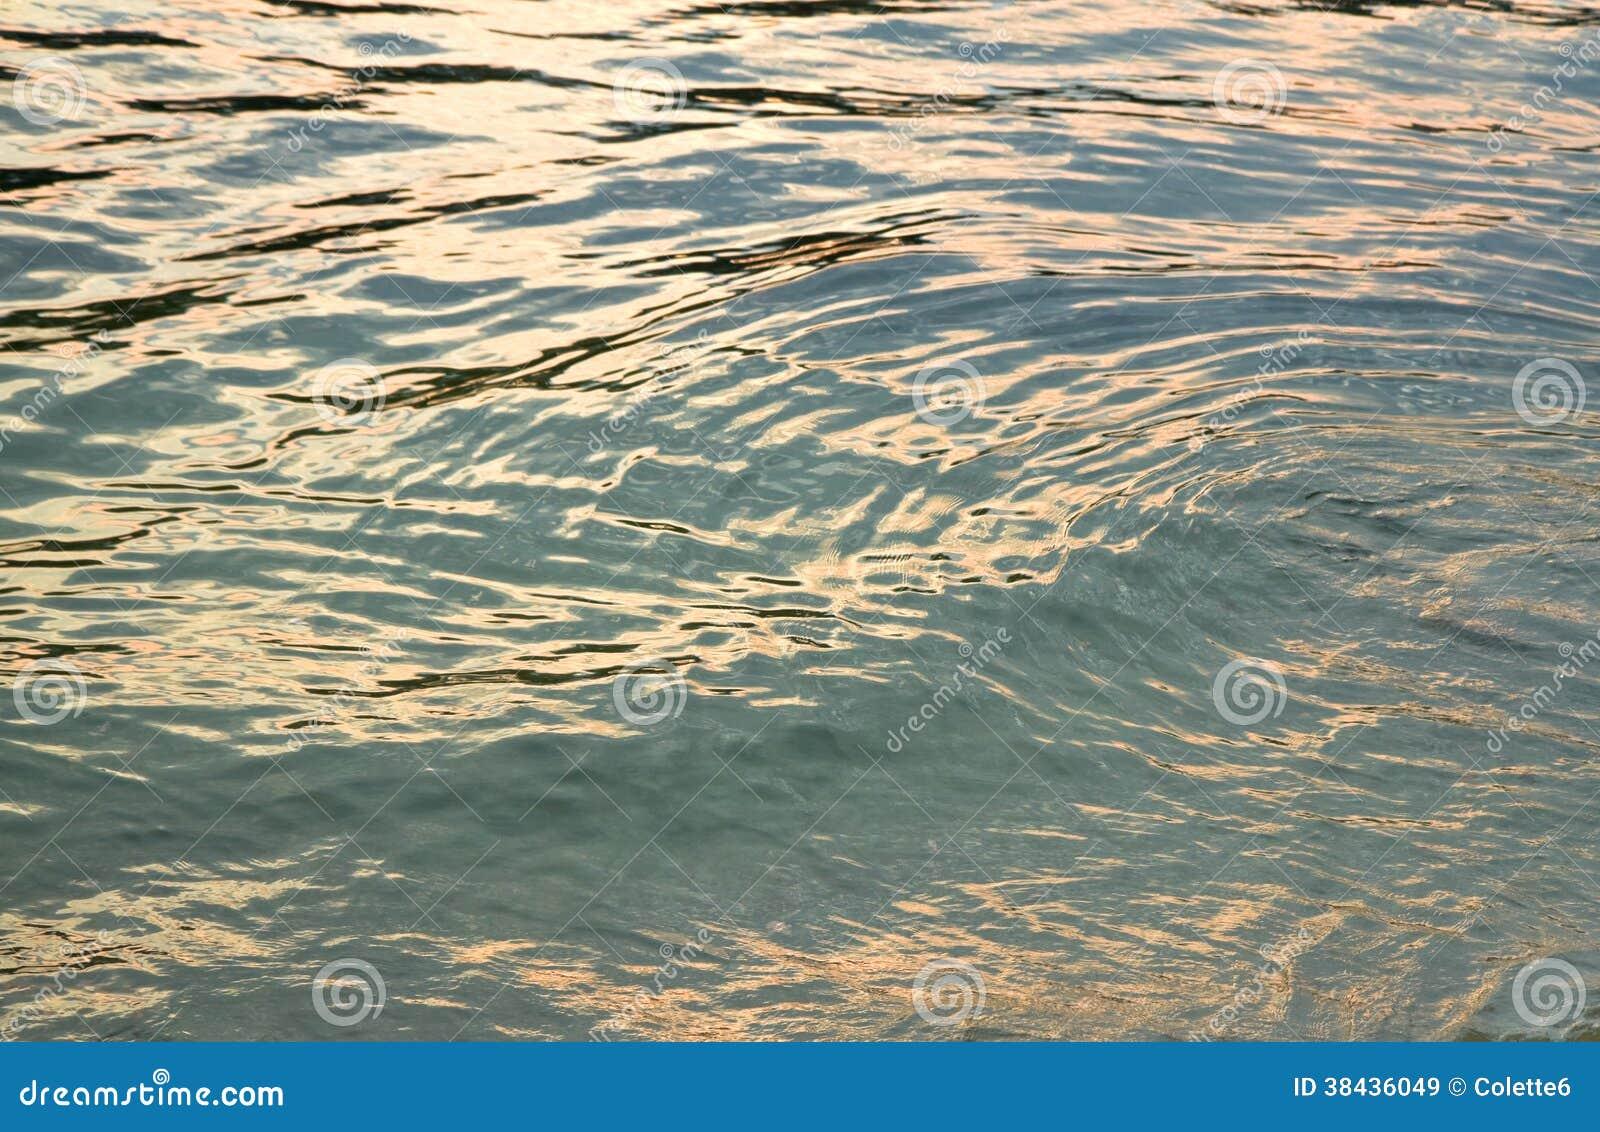 Zonsondergangbezinningen over waterspiegel